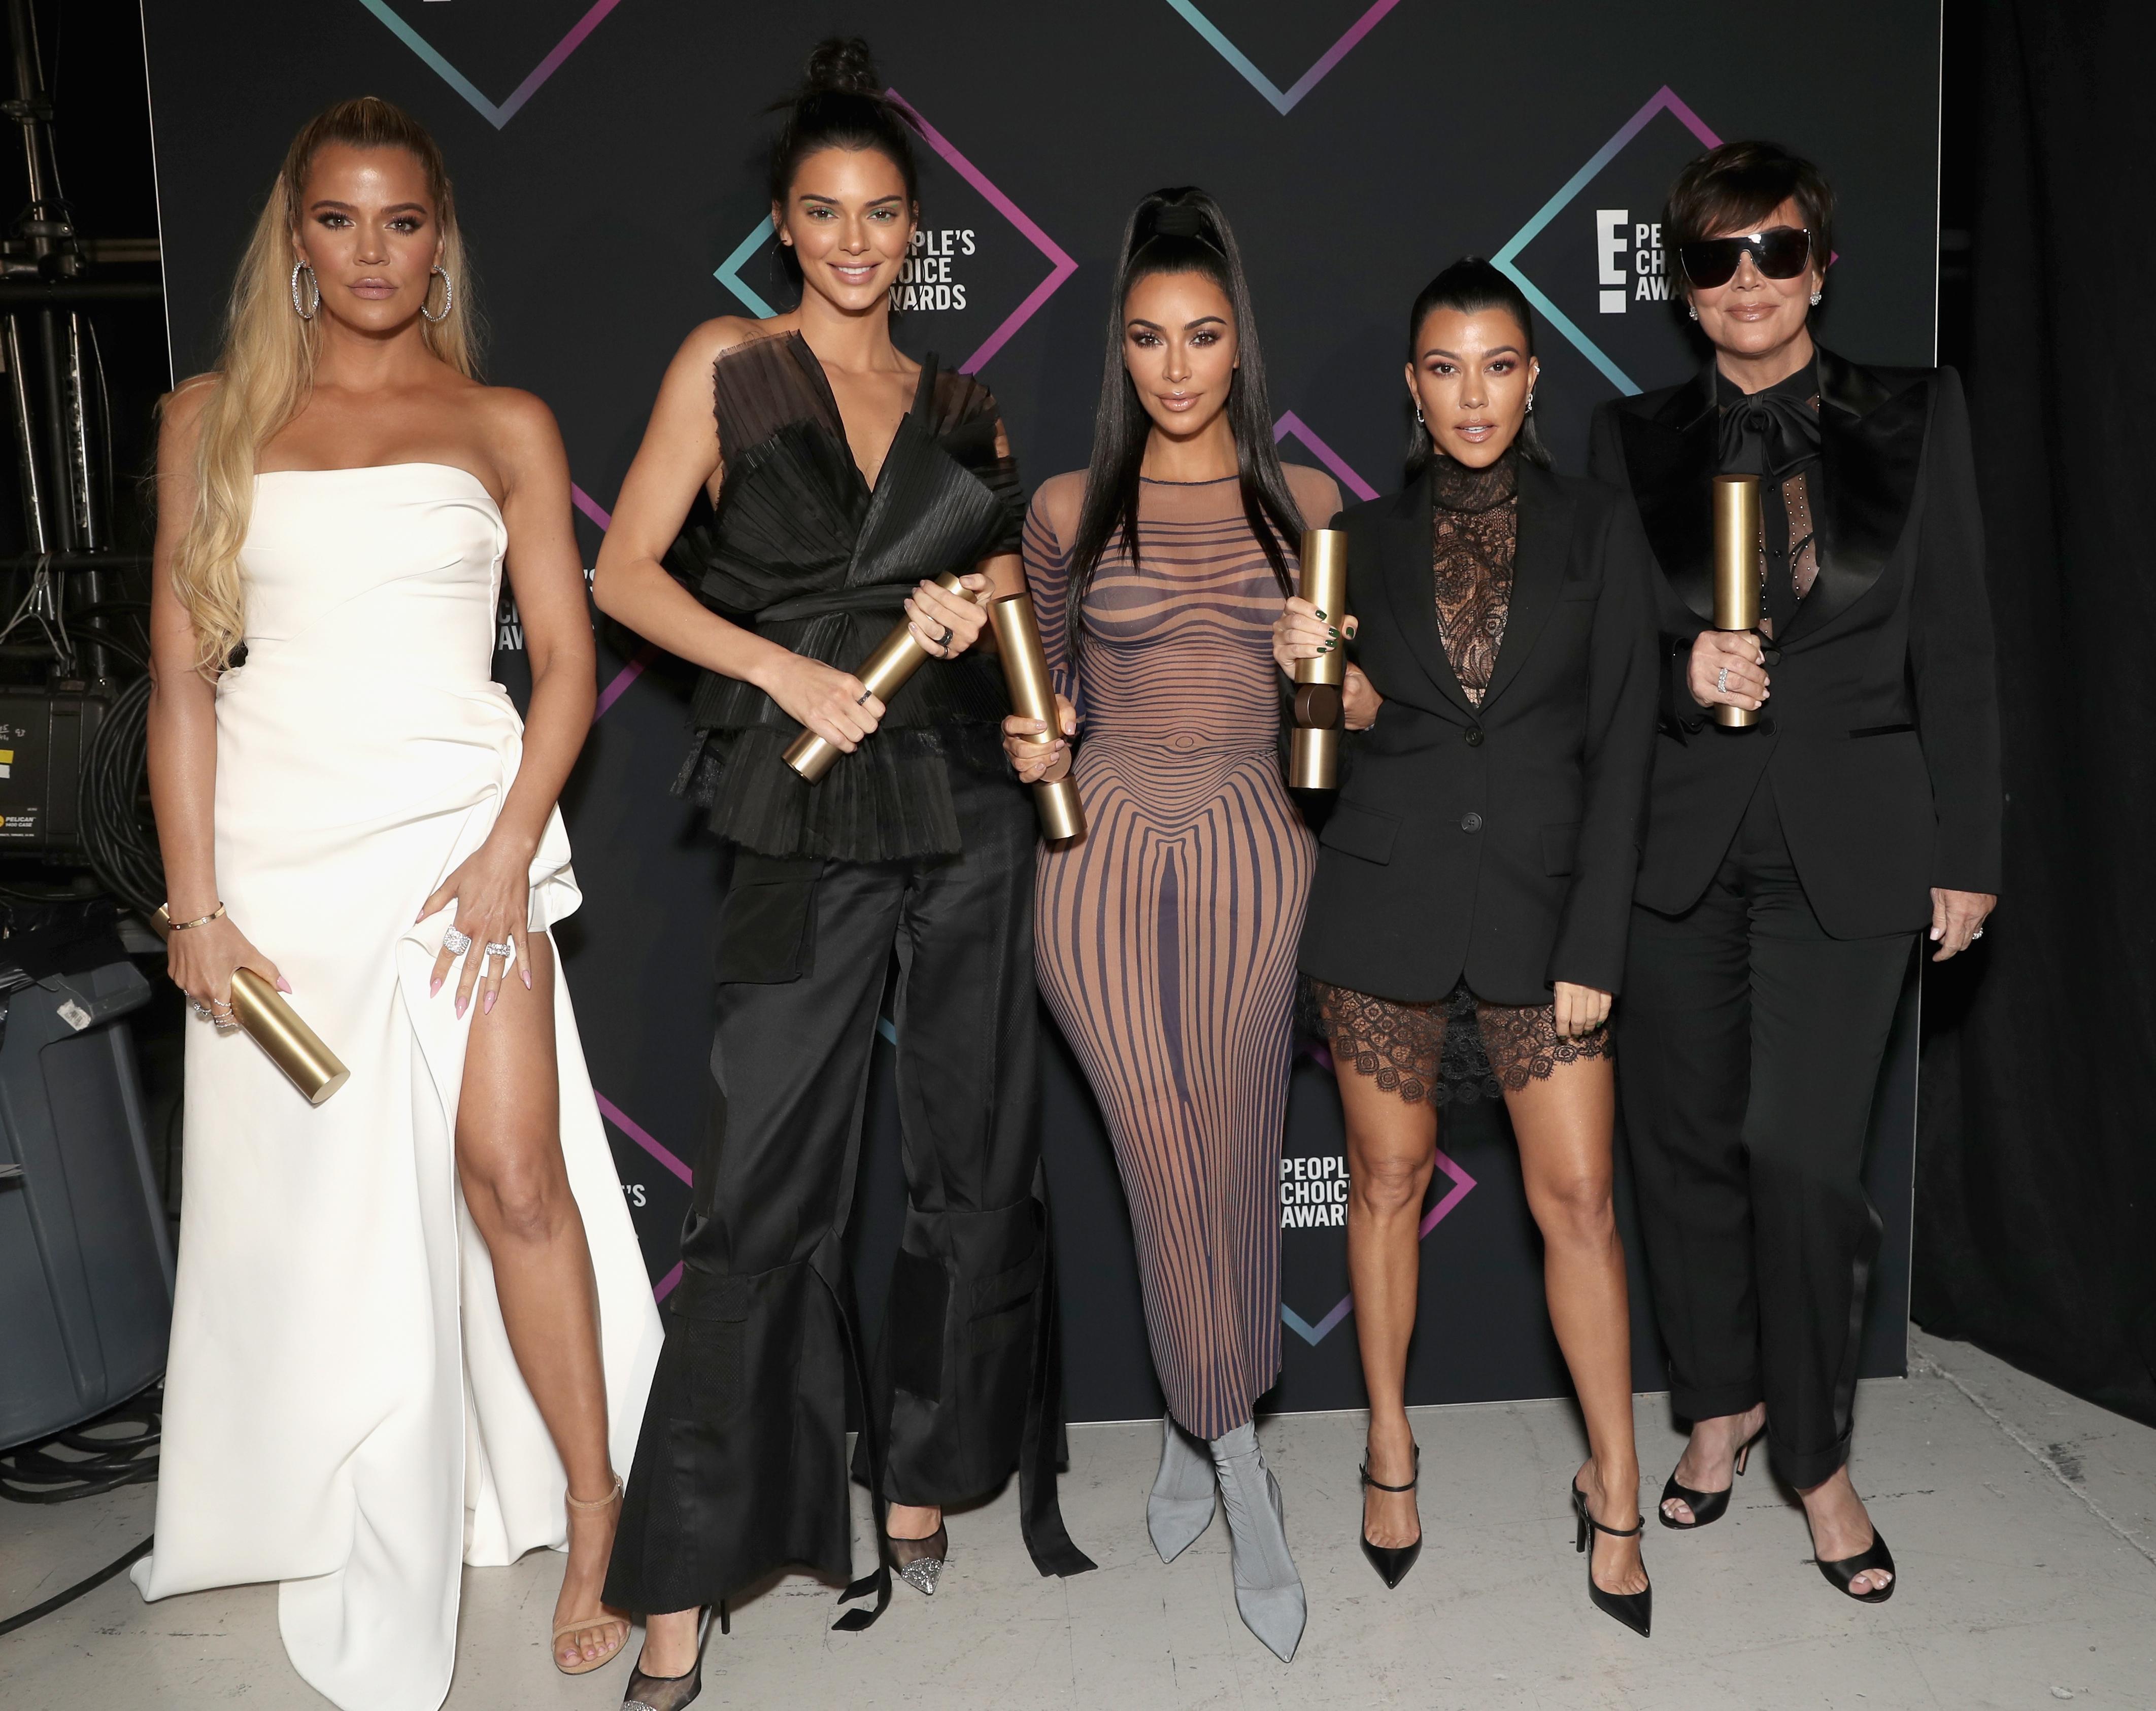 Kris Jenner's sunglasses cause a stir on Twitter